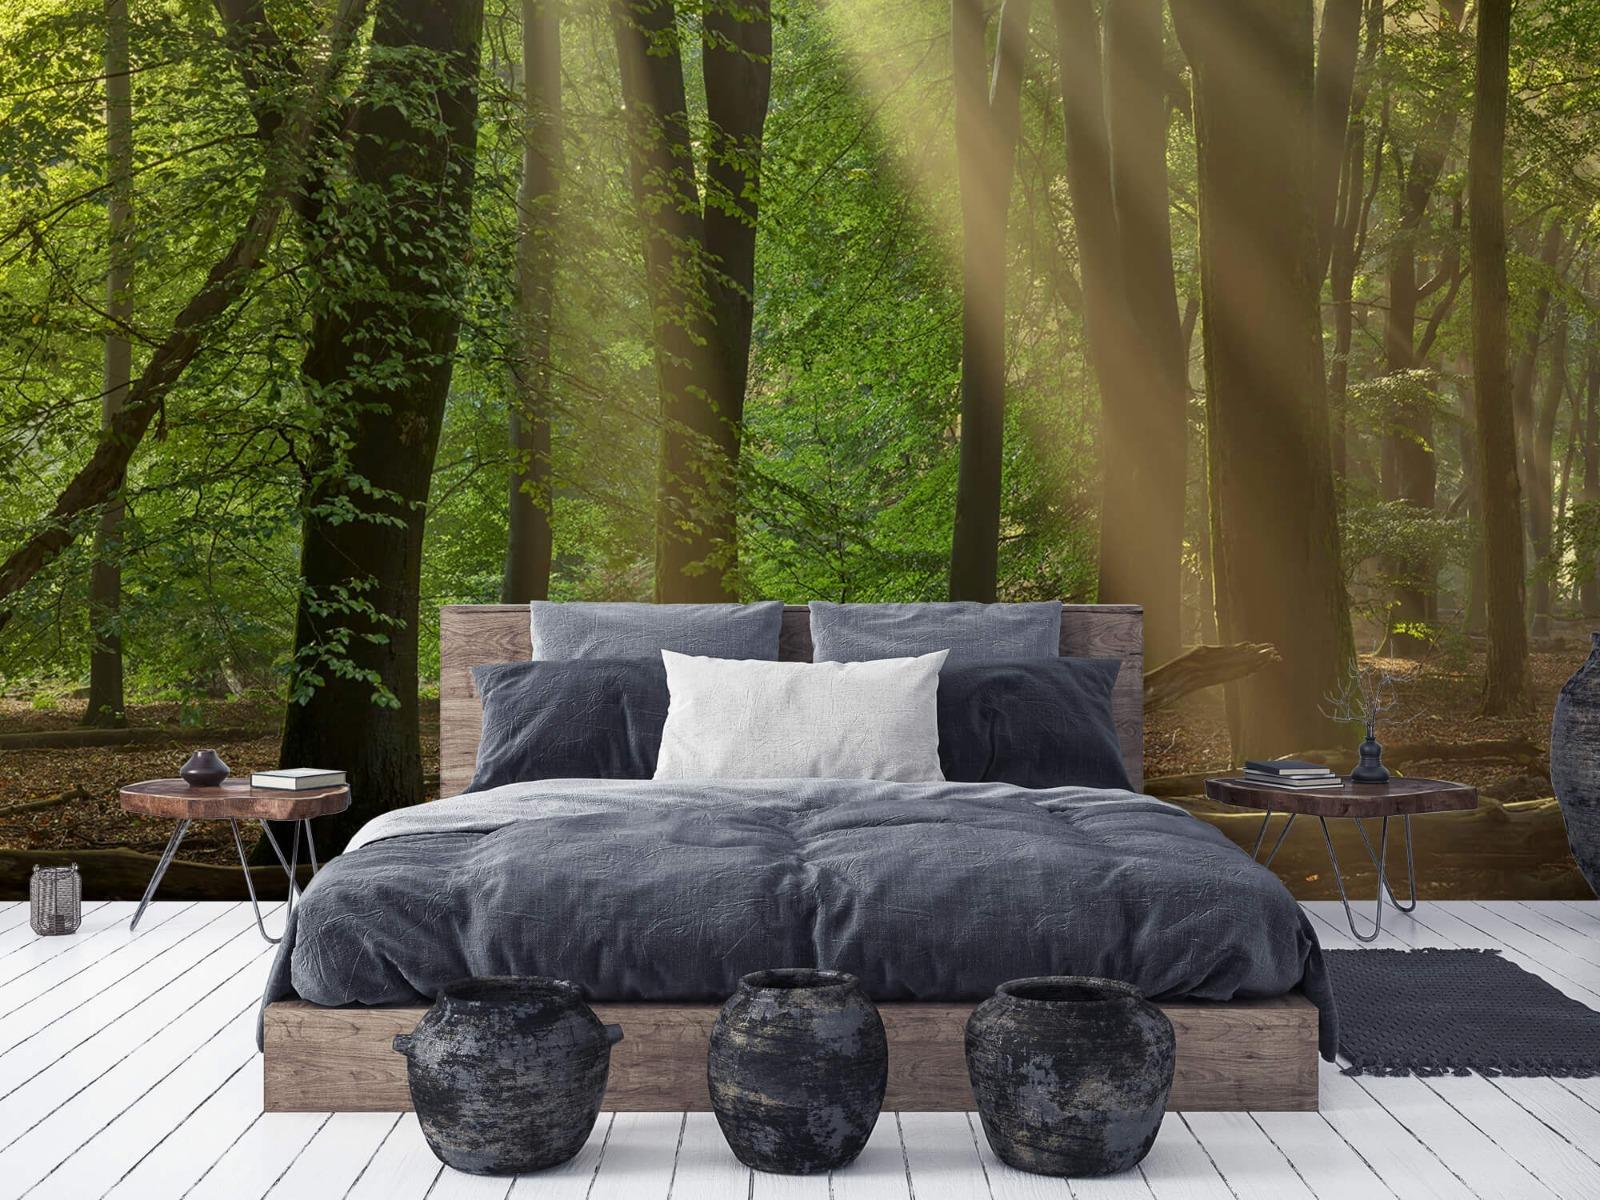 Bomen - Zonneharpen in het bos - Slaapkamer 5